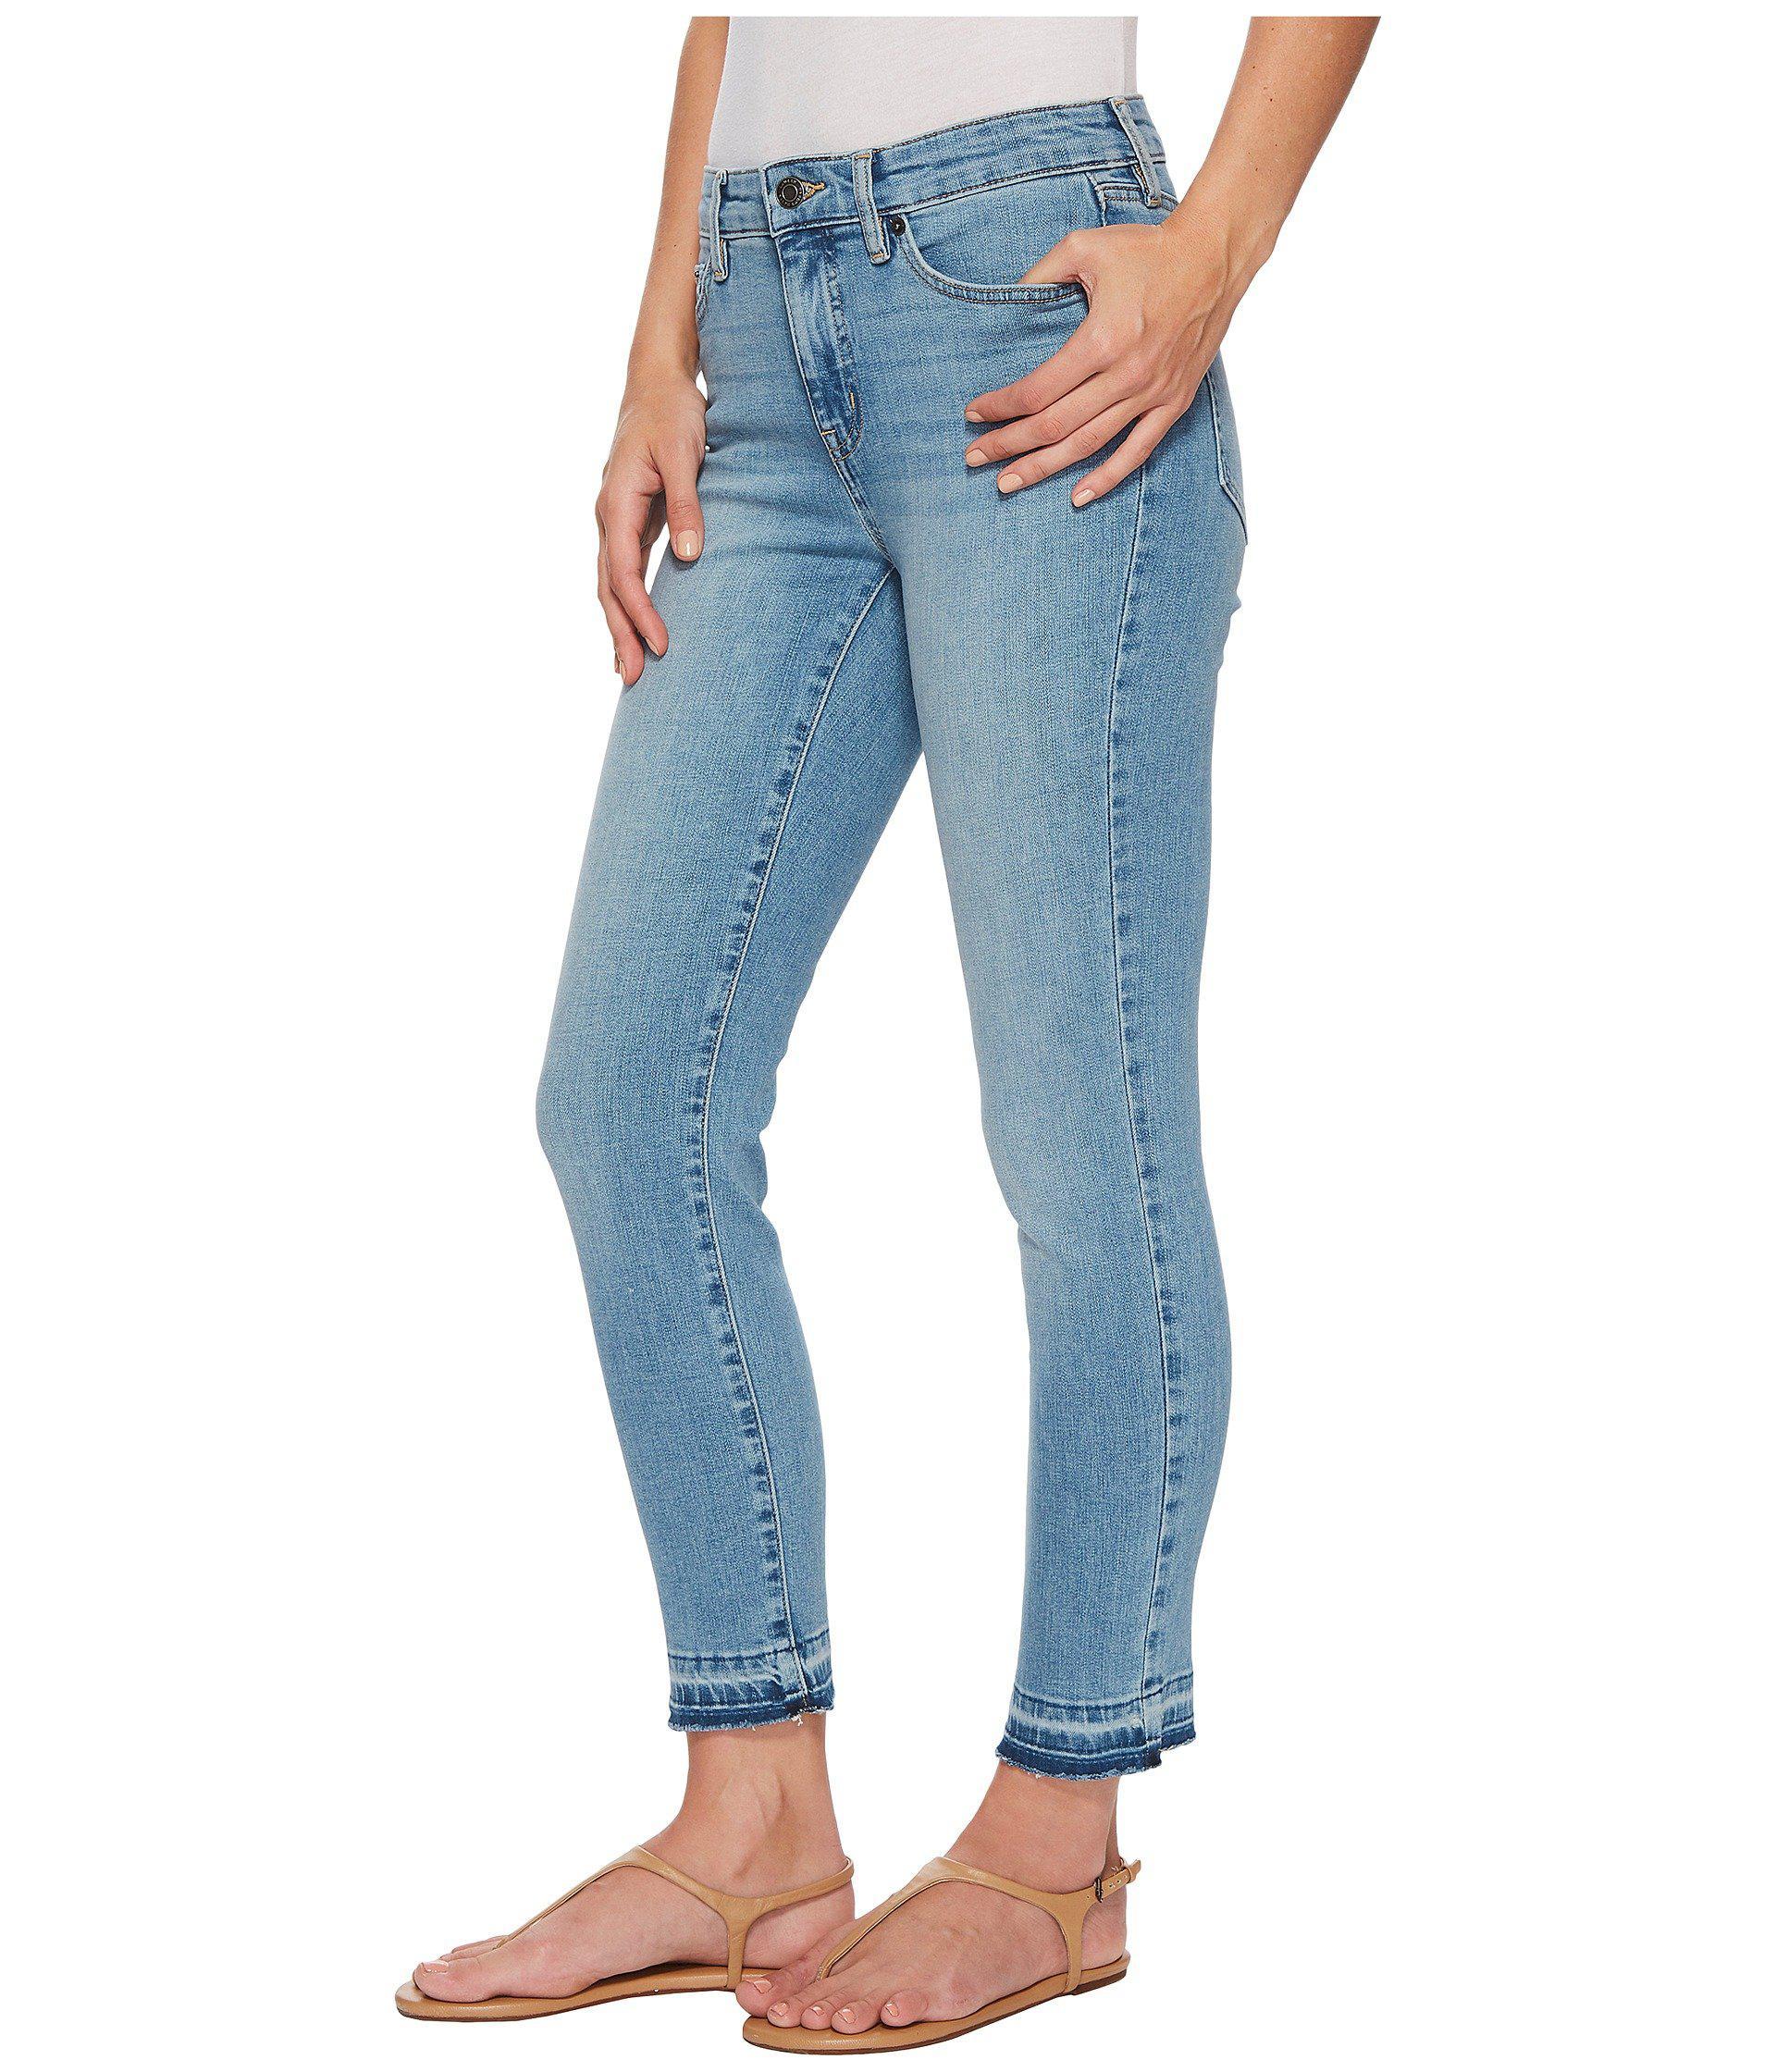 e02a3dd9df27a Lyst - Lauren by Ralph Lauren Premier Straight Crop Jeans in Blue - Save 51%